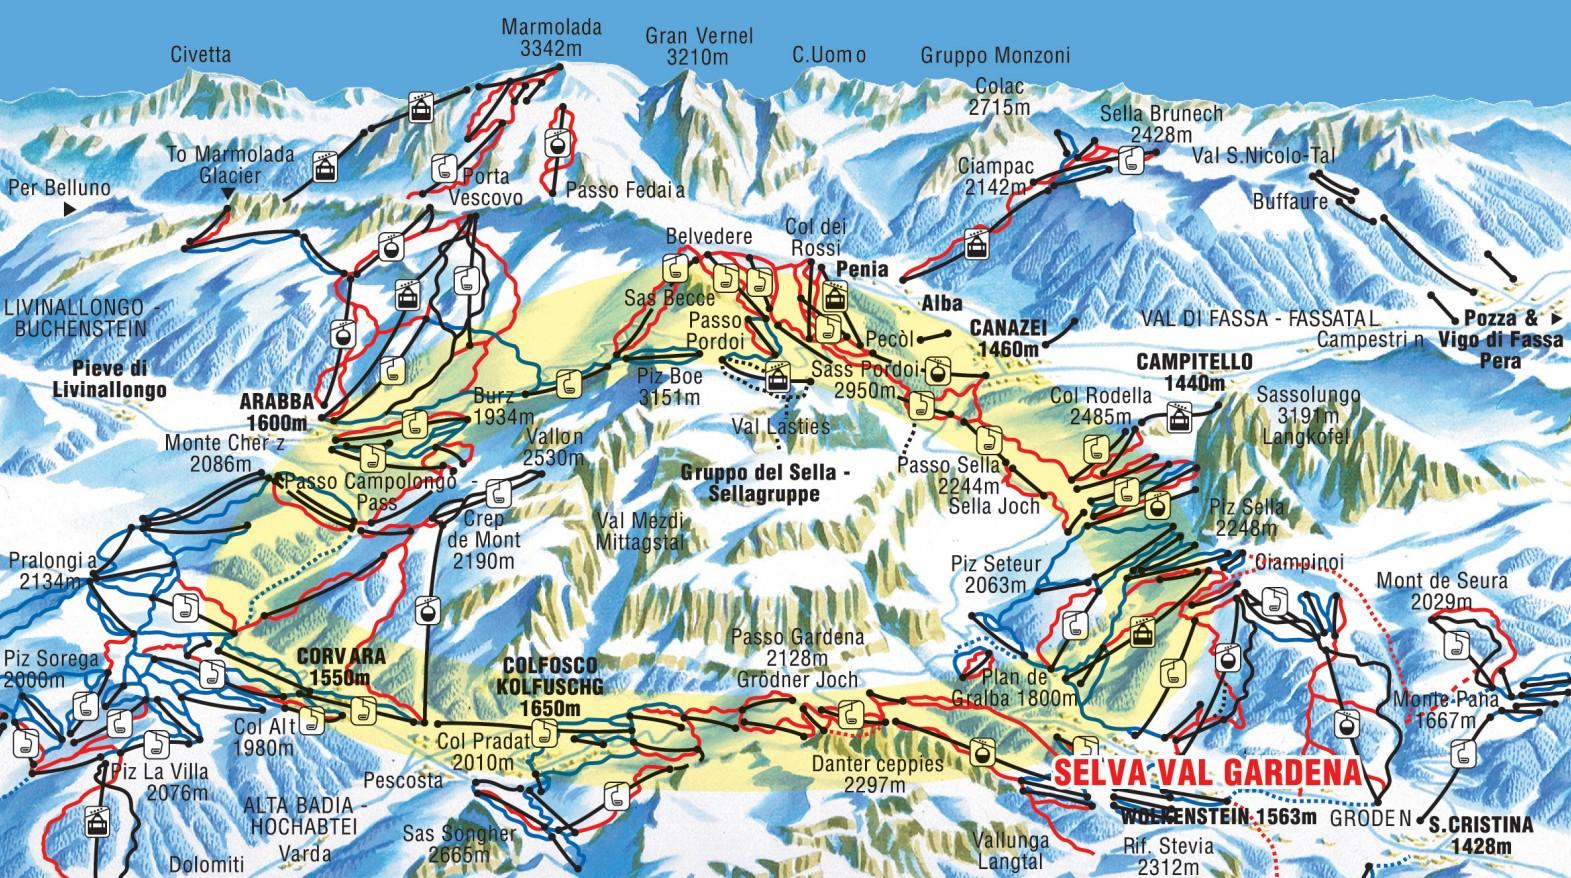 Campitello Piste / Trail Map